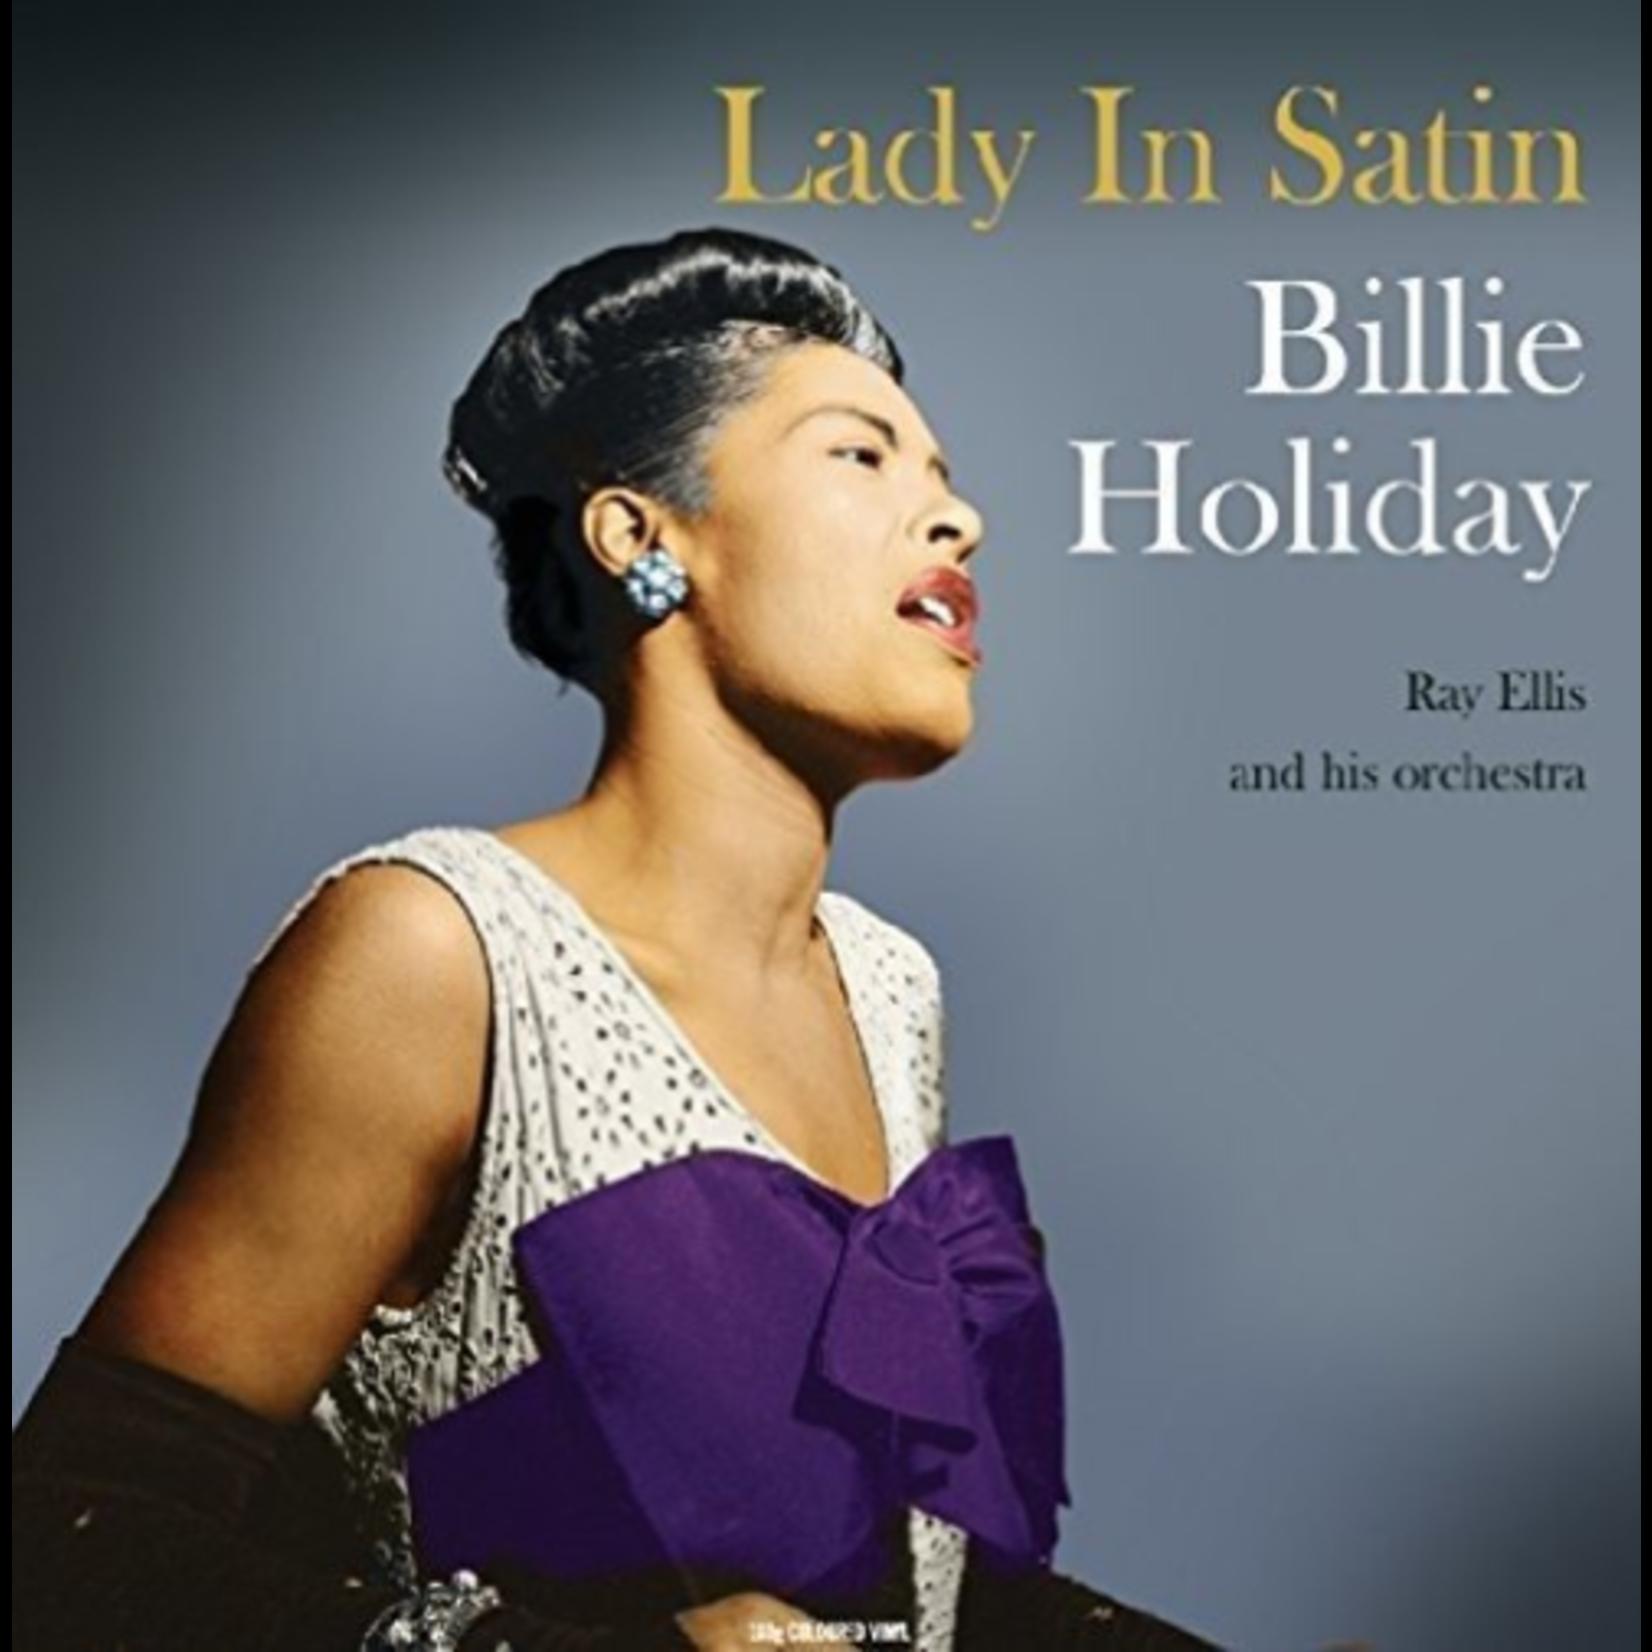 BILLIE HOLIDAY LADY IN SATIN (180G HQ VINYL TRANSPARENT VINYL)